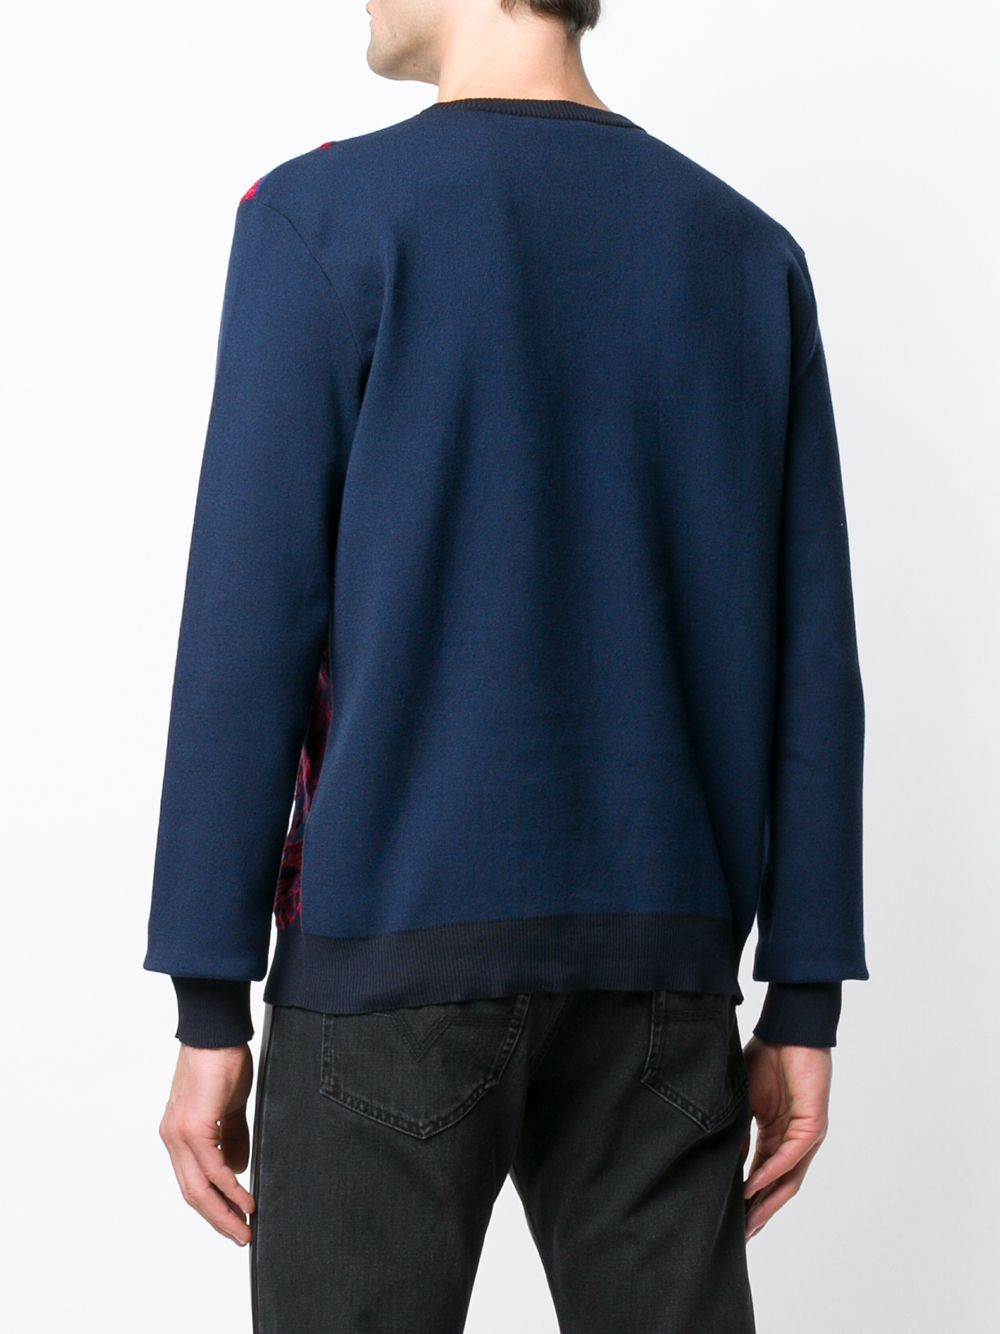 Versace | свитер жаккардовой вязки | Clouty